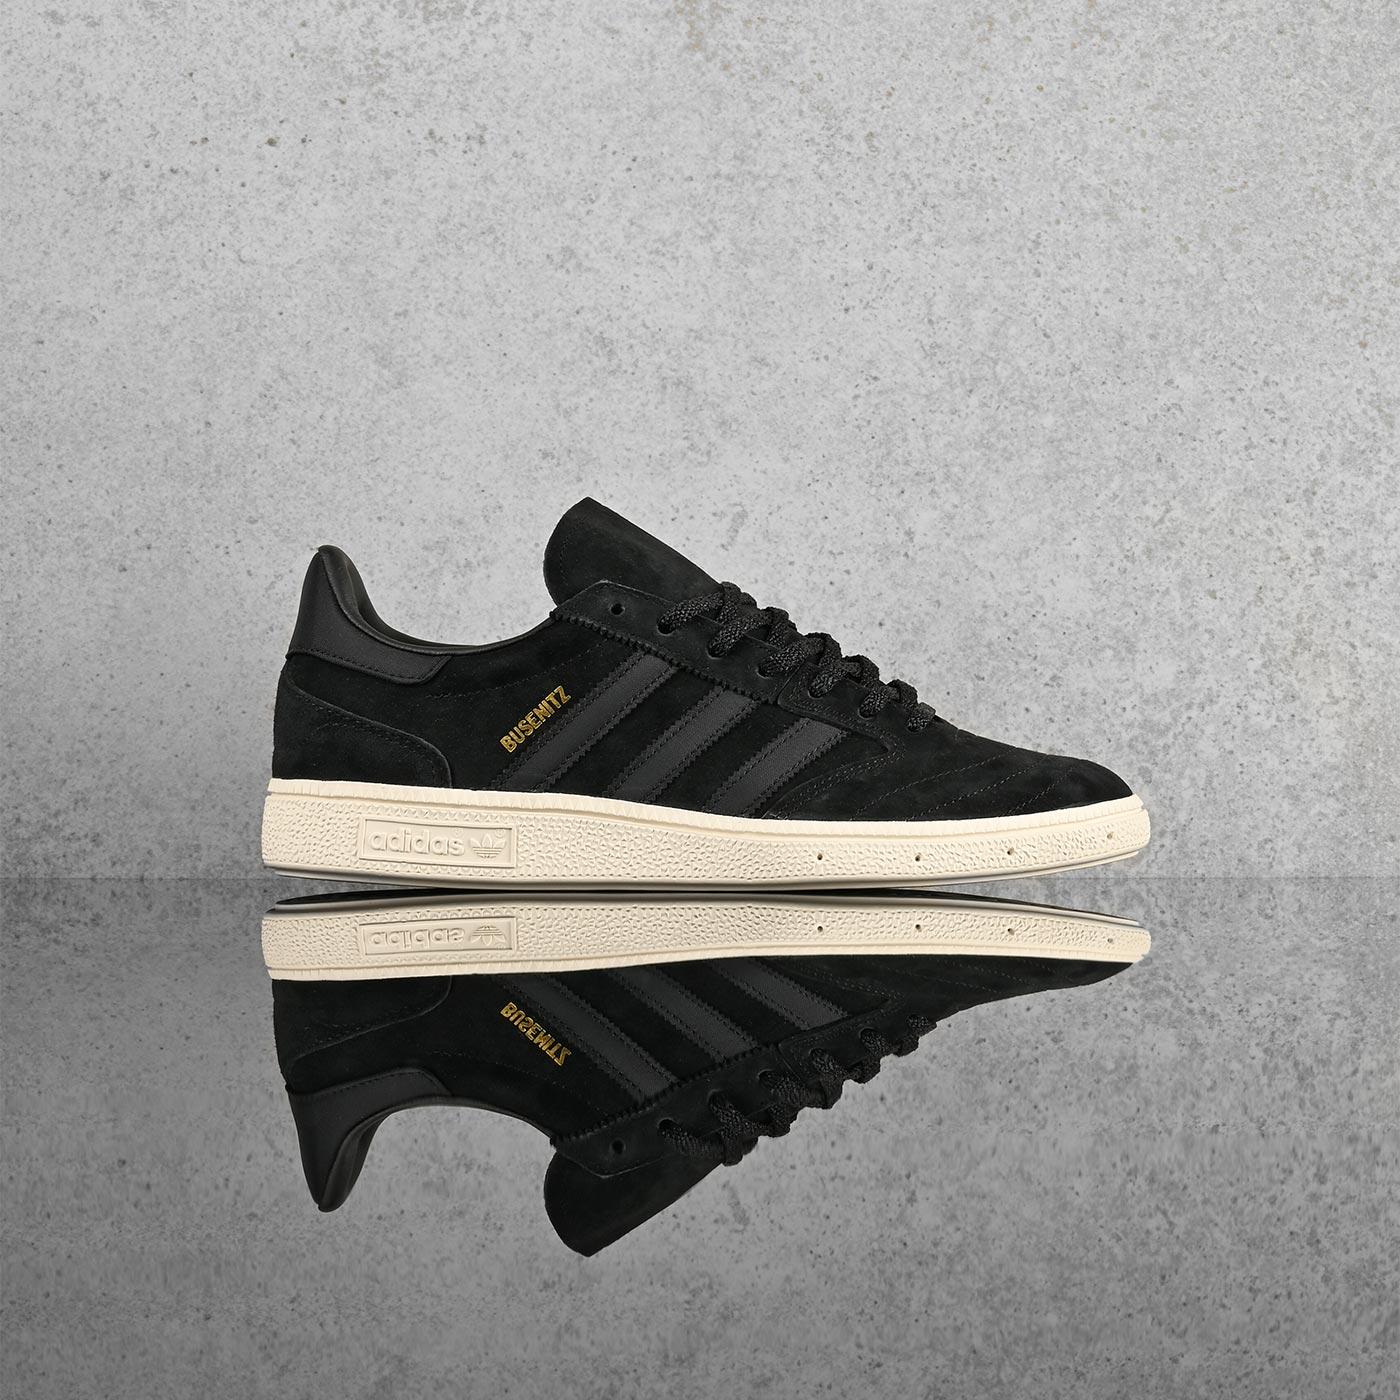 Adidas Busenitz Vintage Skate Shoes